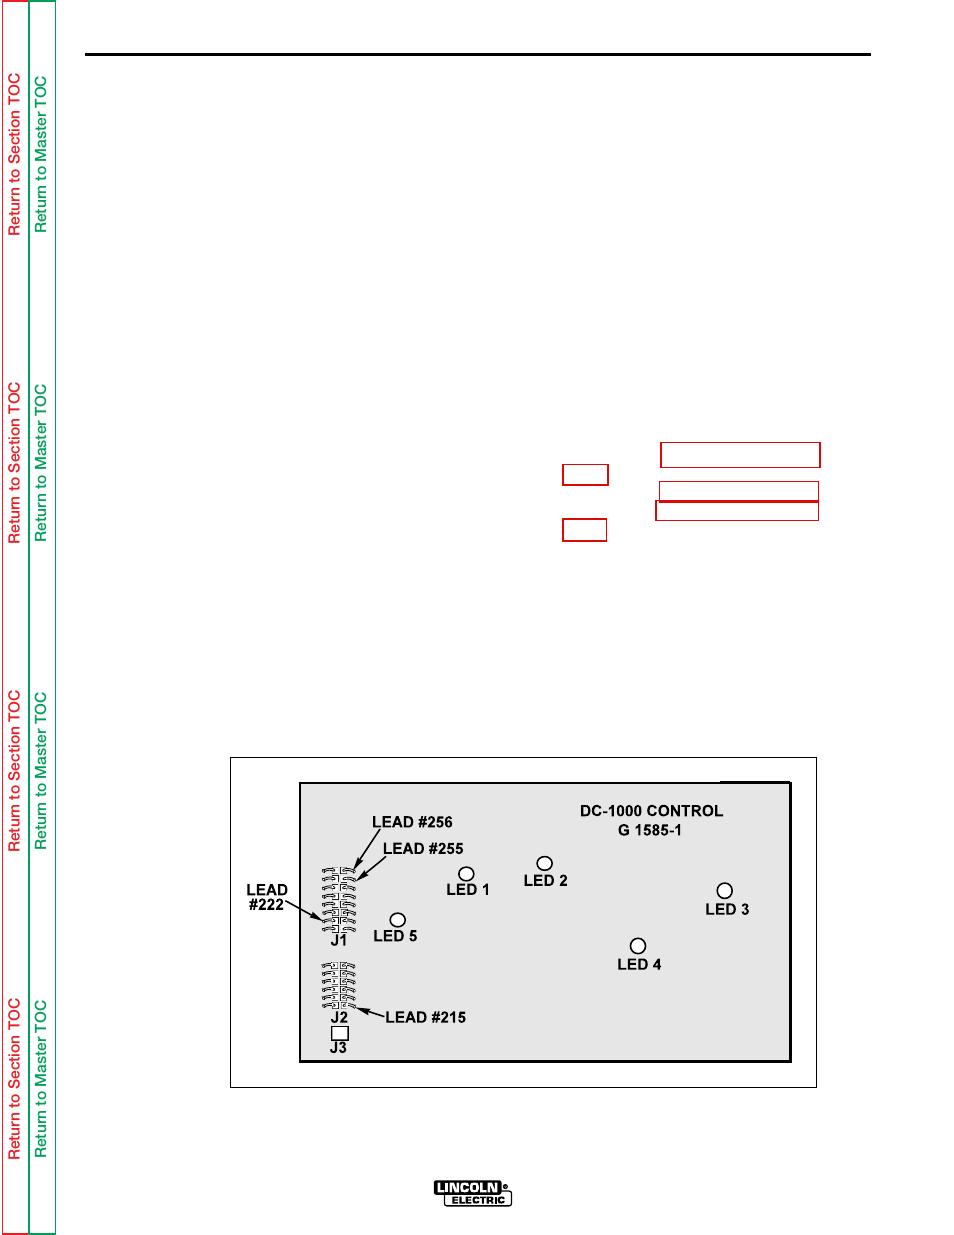 Lincoln Dc 1000 Wiring Diagram Schematics Diagrams 1975 Continental Engine Troubleshooting Repair Control Board Test Electric Rh Manualsdir Com Online 1999 Navigator